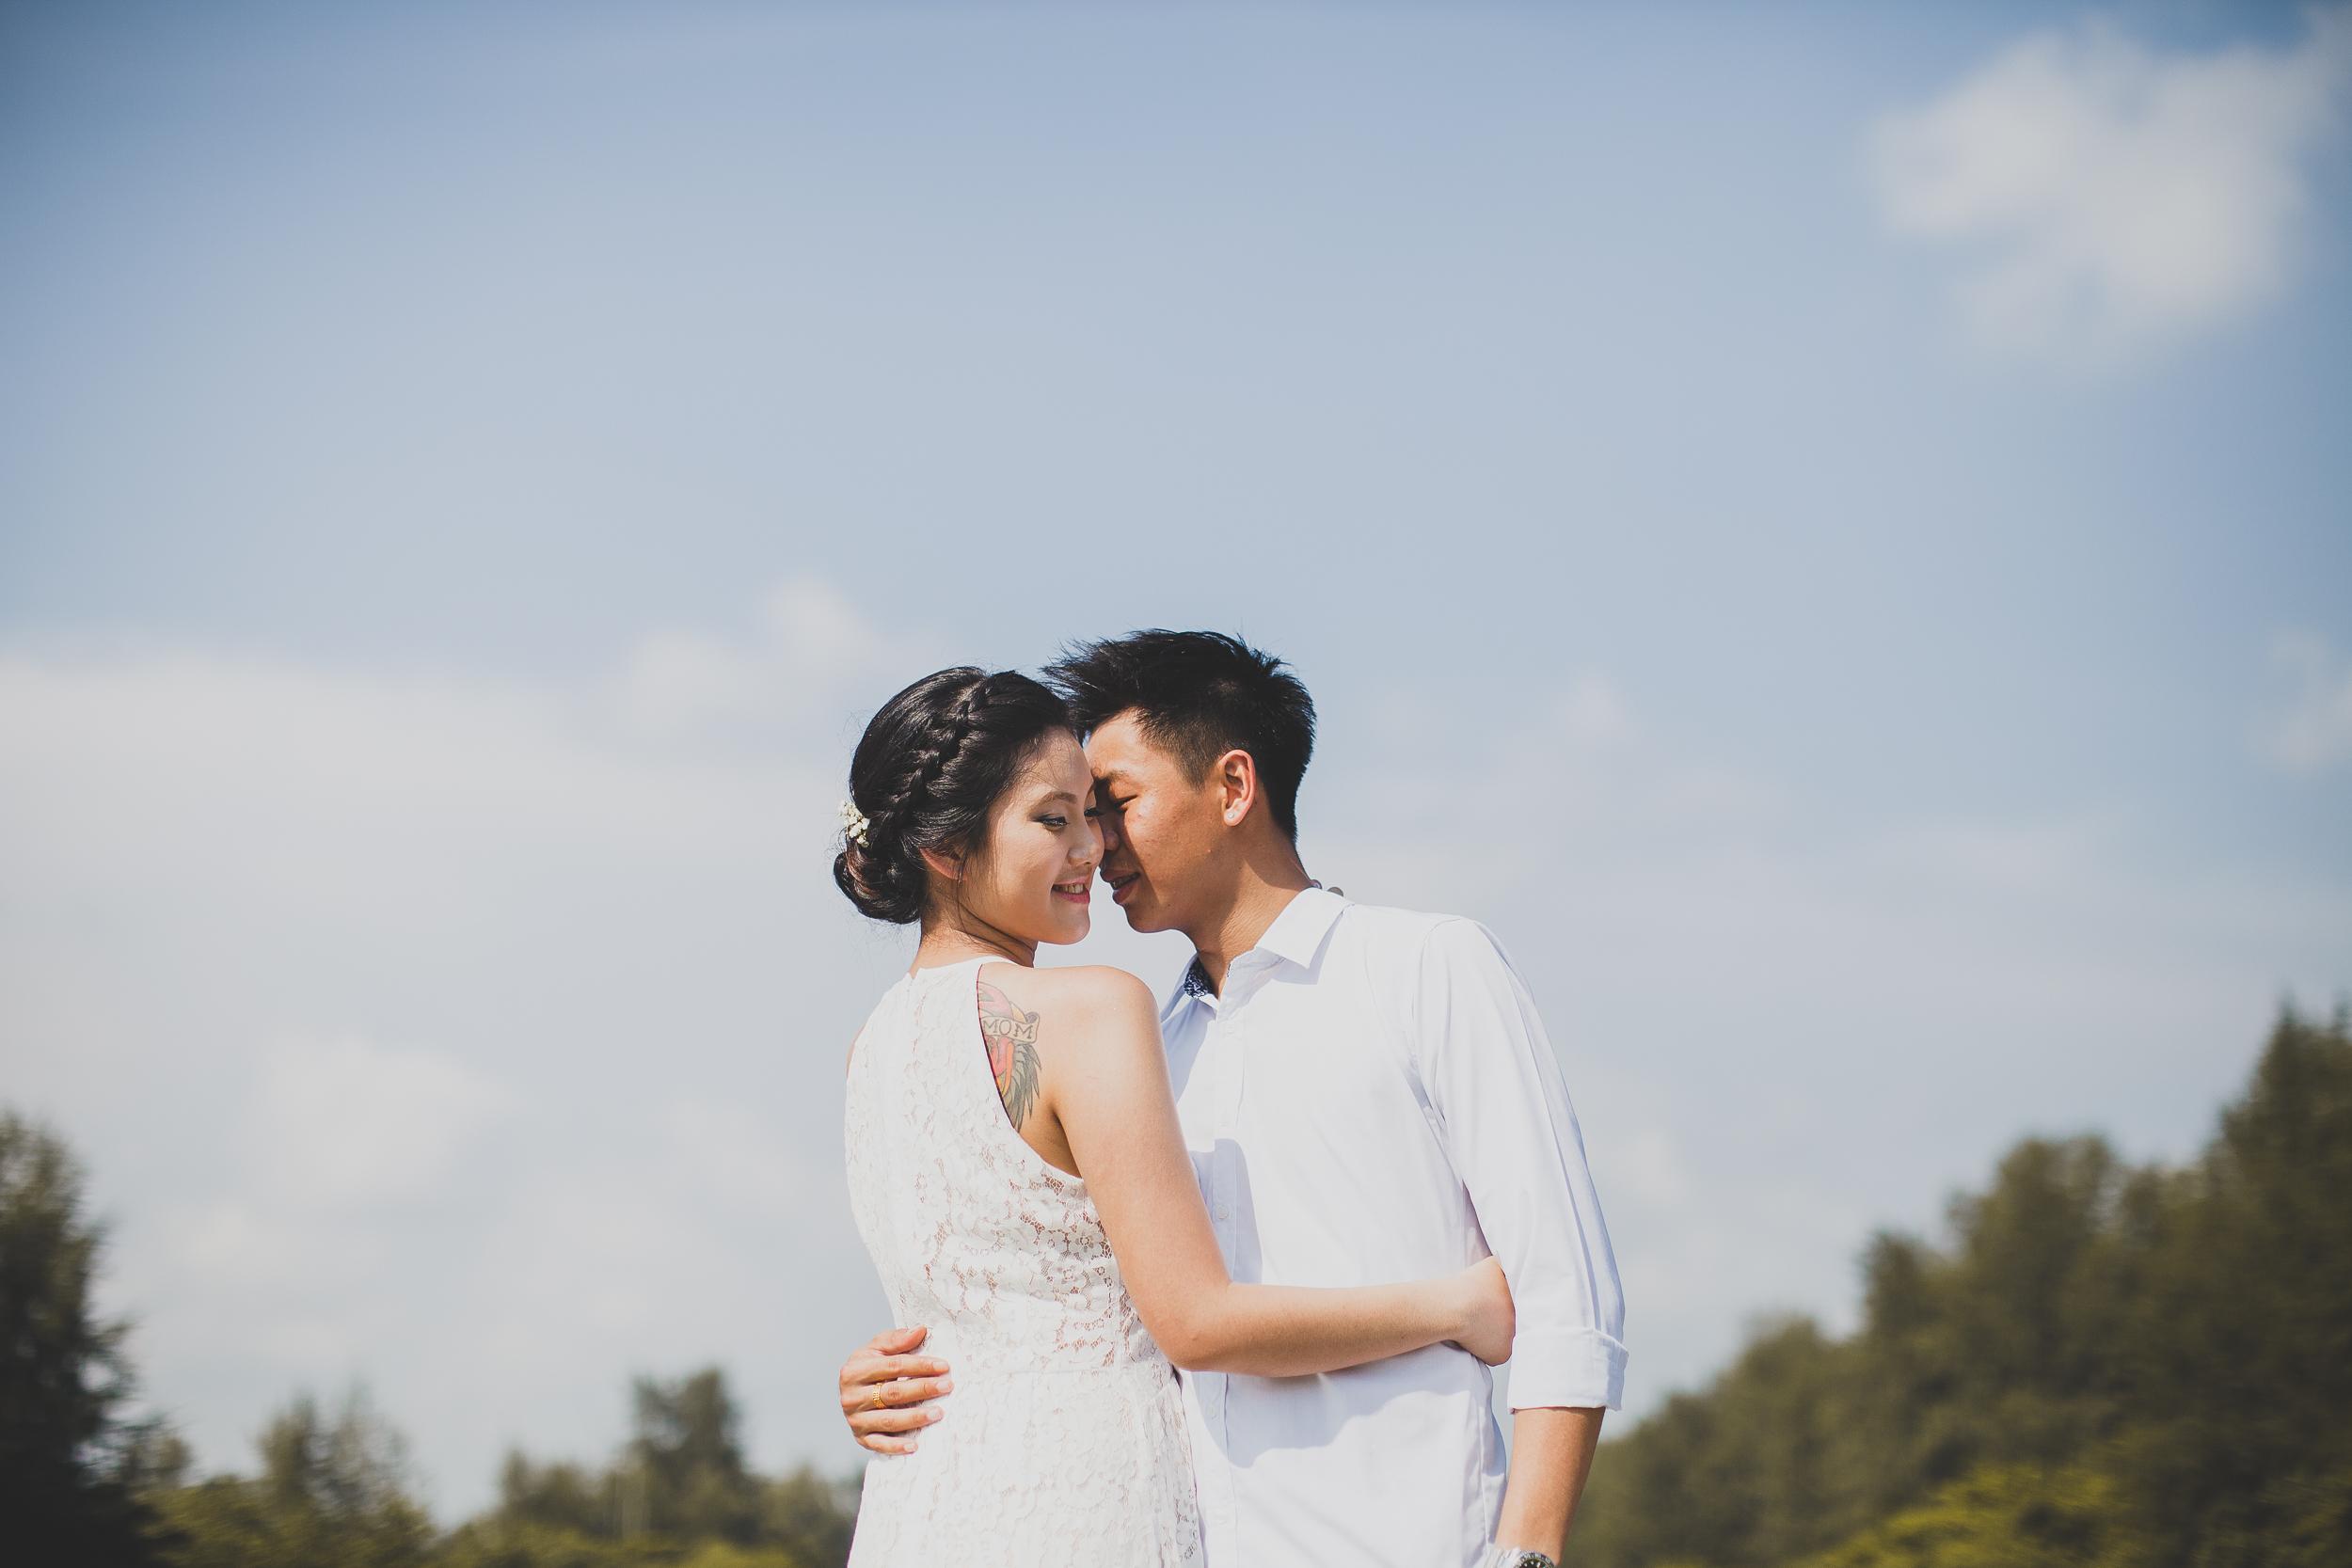 Singapore+Pre+Wedding+Photographer+Ziyang+Clara-0038.jpg